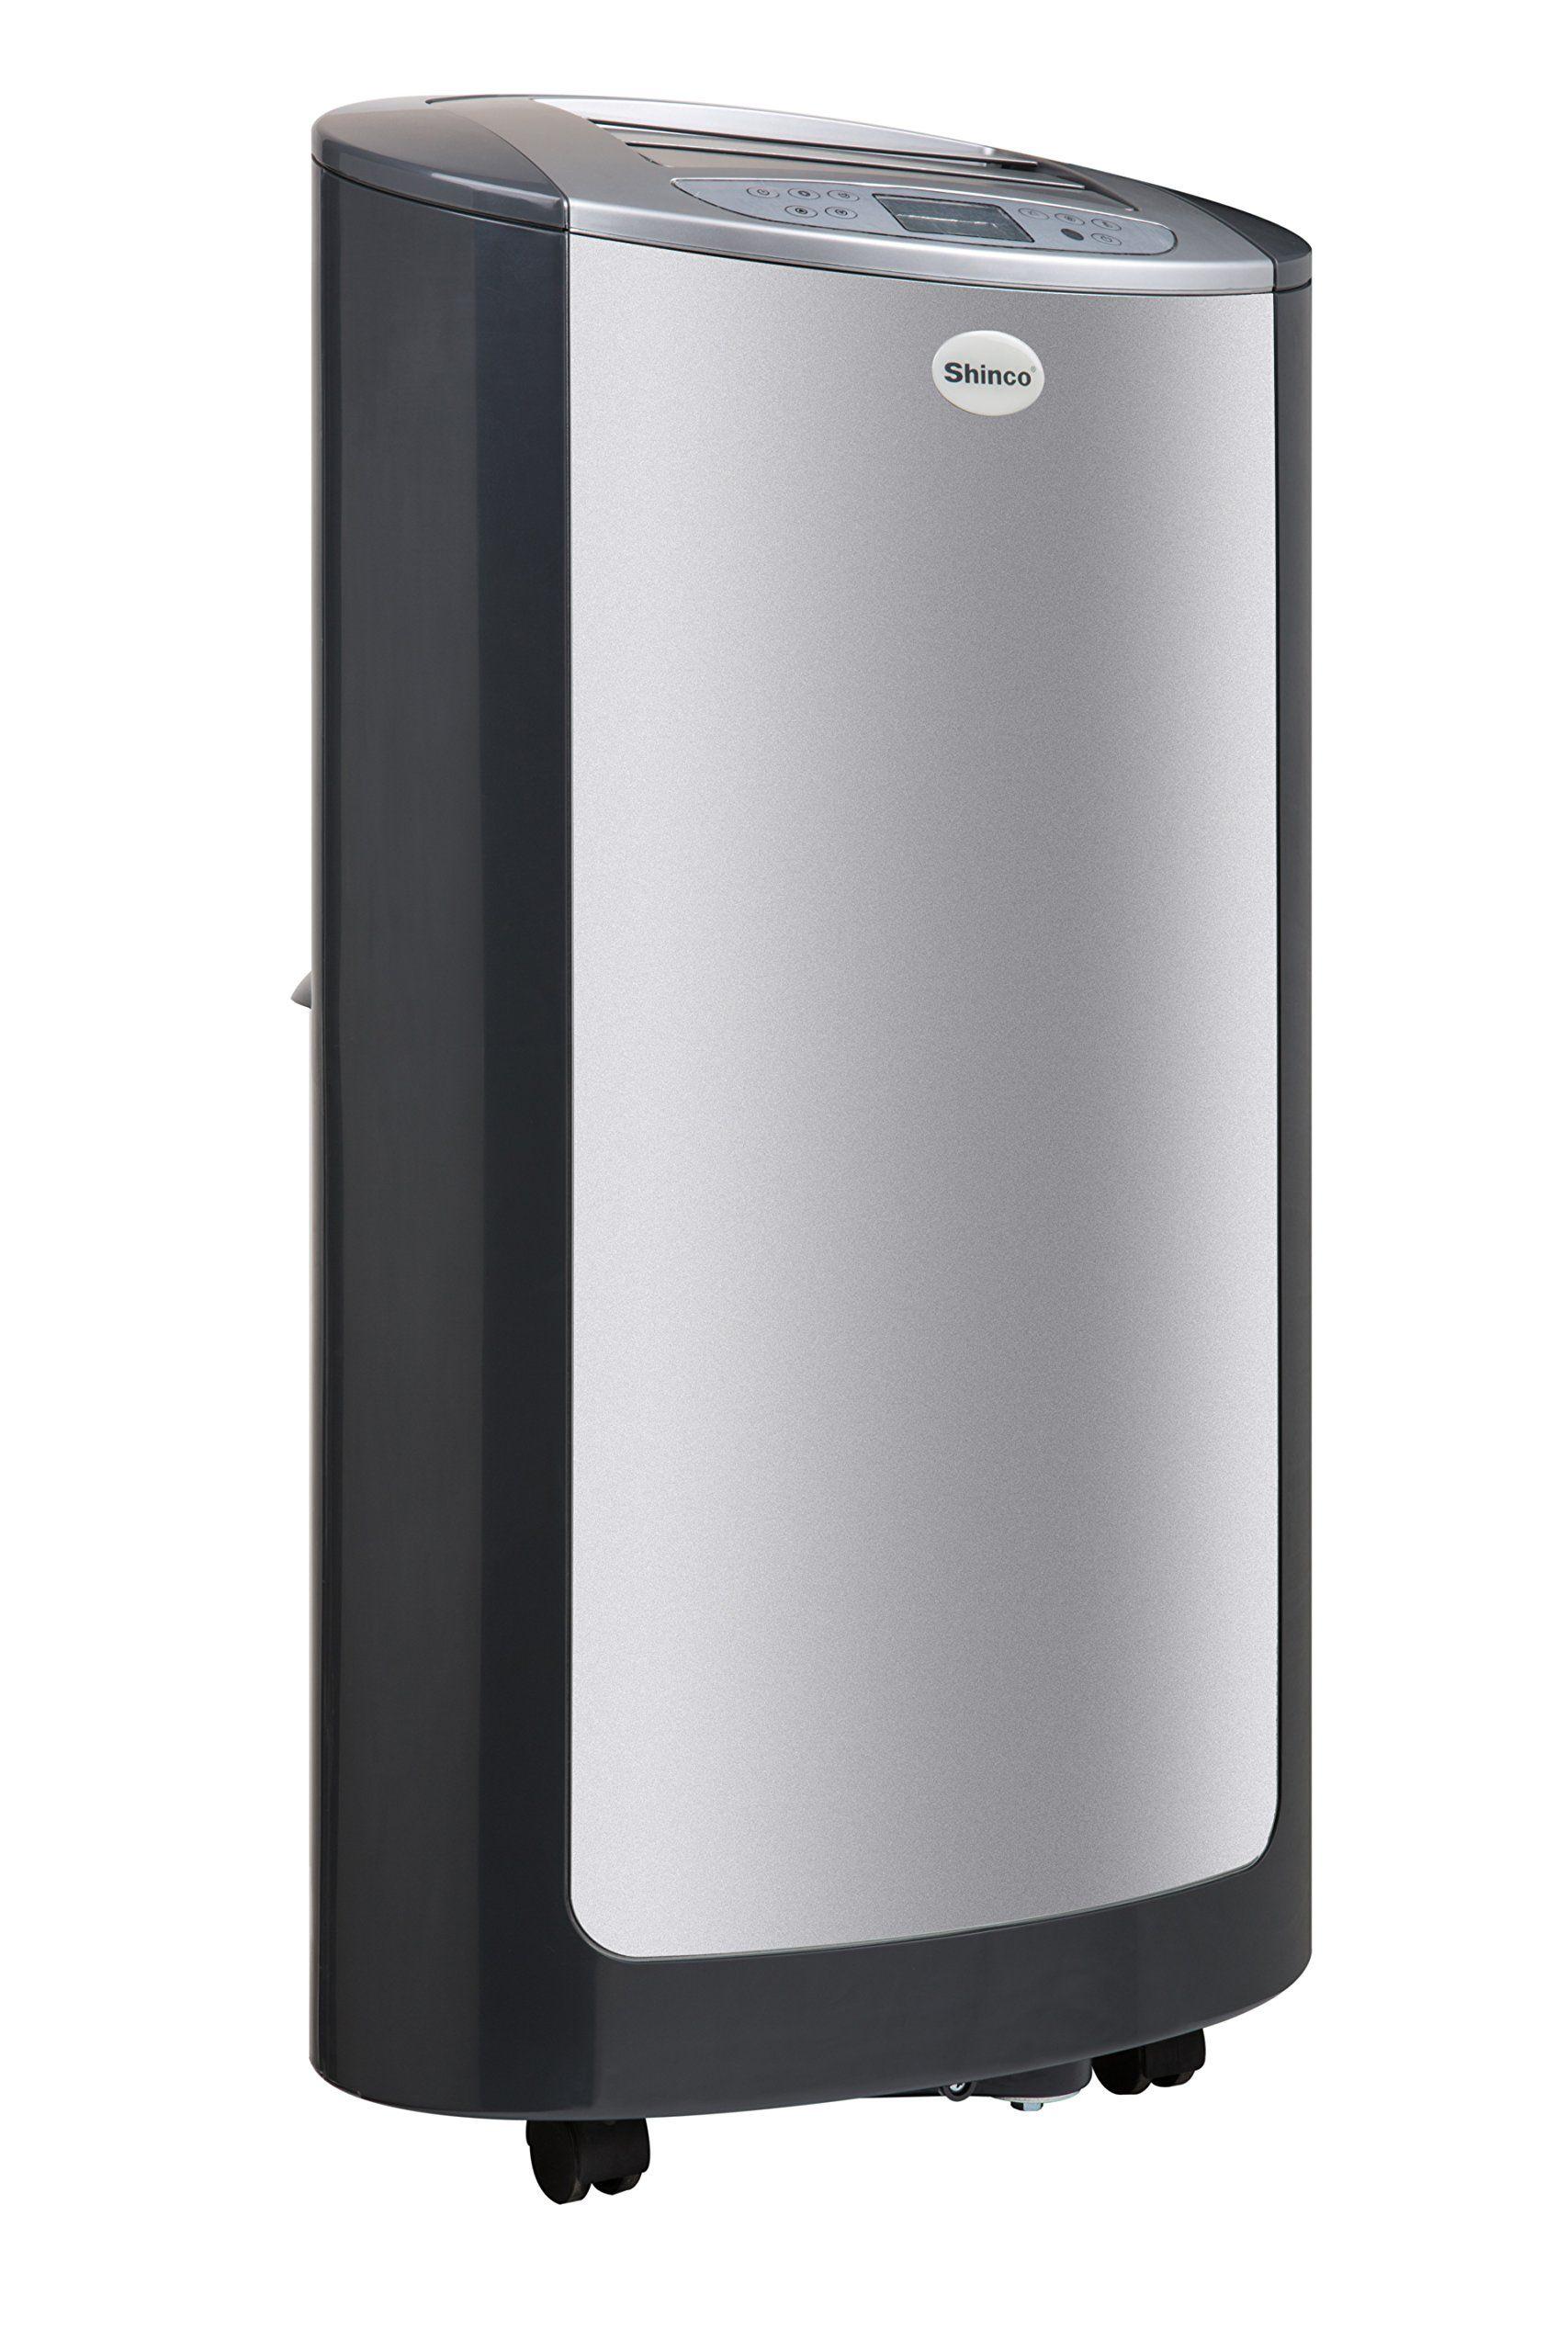 Shinco Ypn09c Portable Air Conditioner With Remote Control 9000 Btu Click On The Portable Air Conditioner Smallest Air Conditioner Standing Air Conditioner